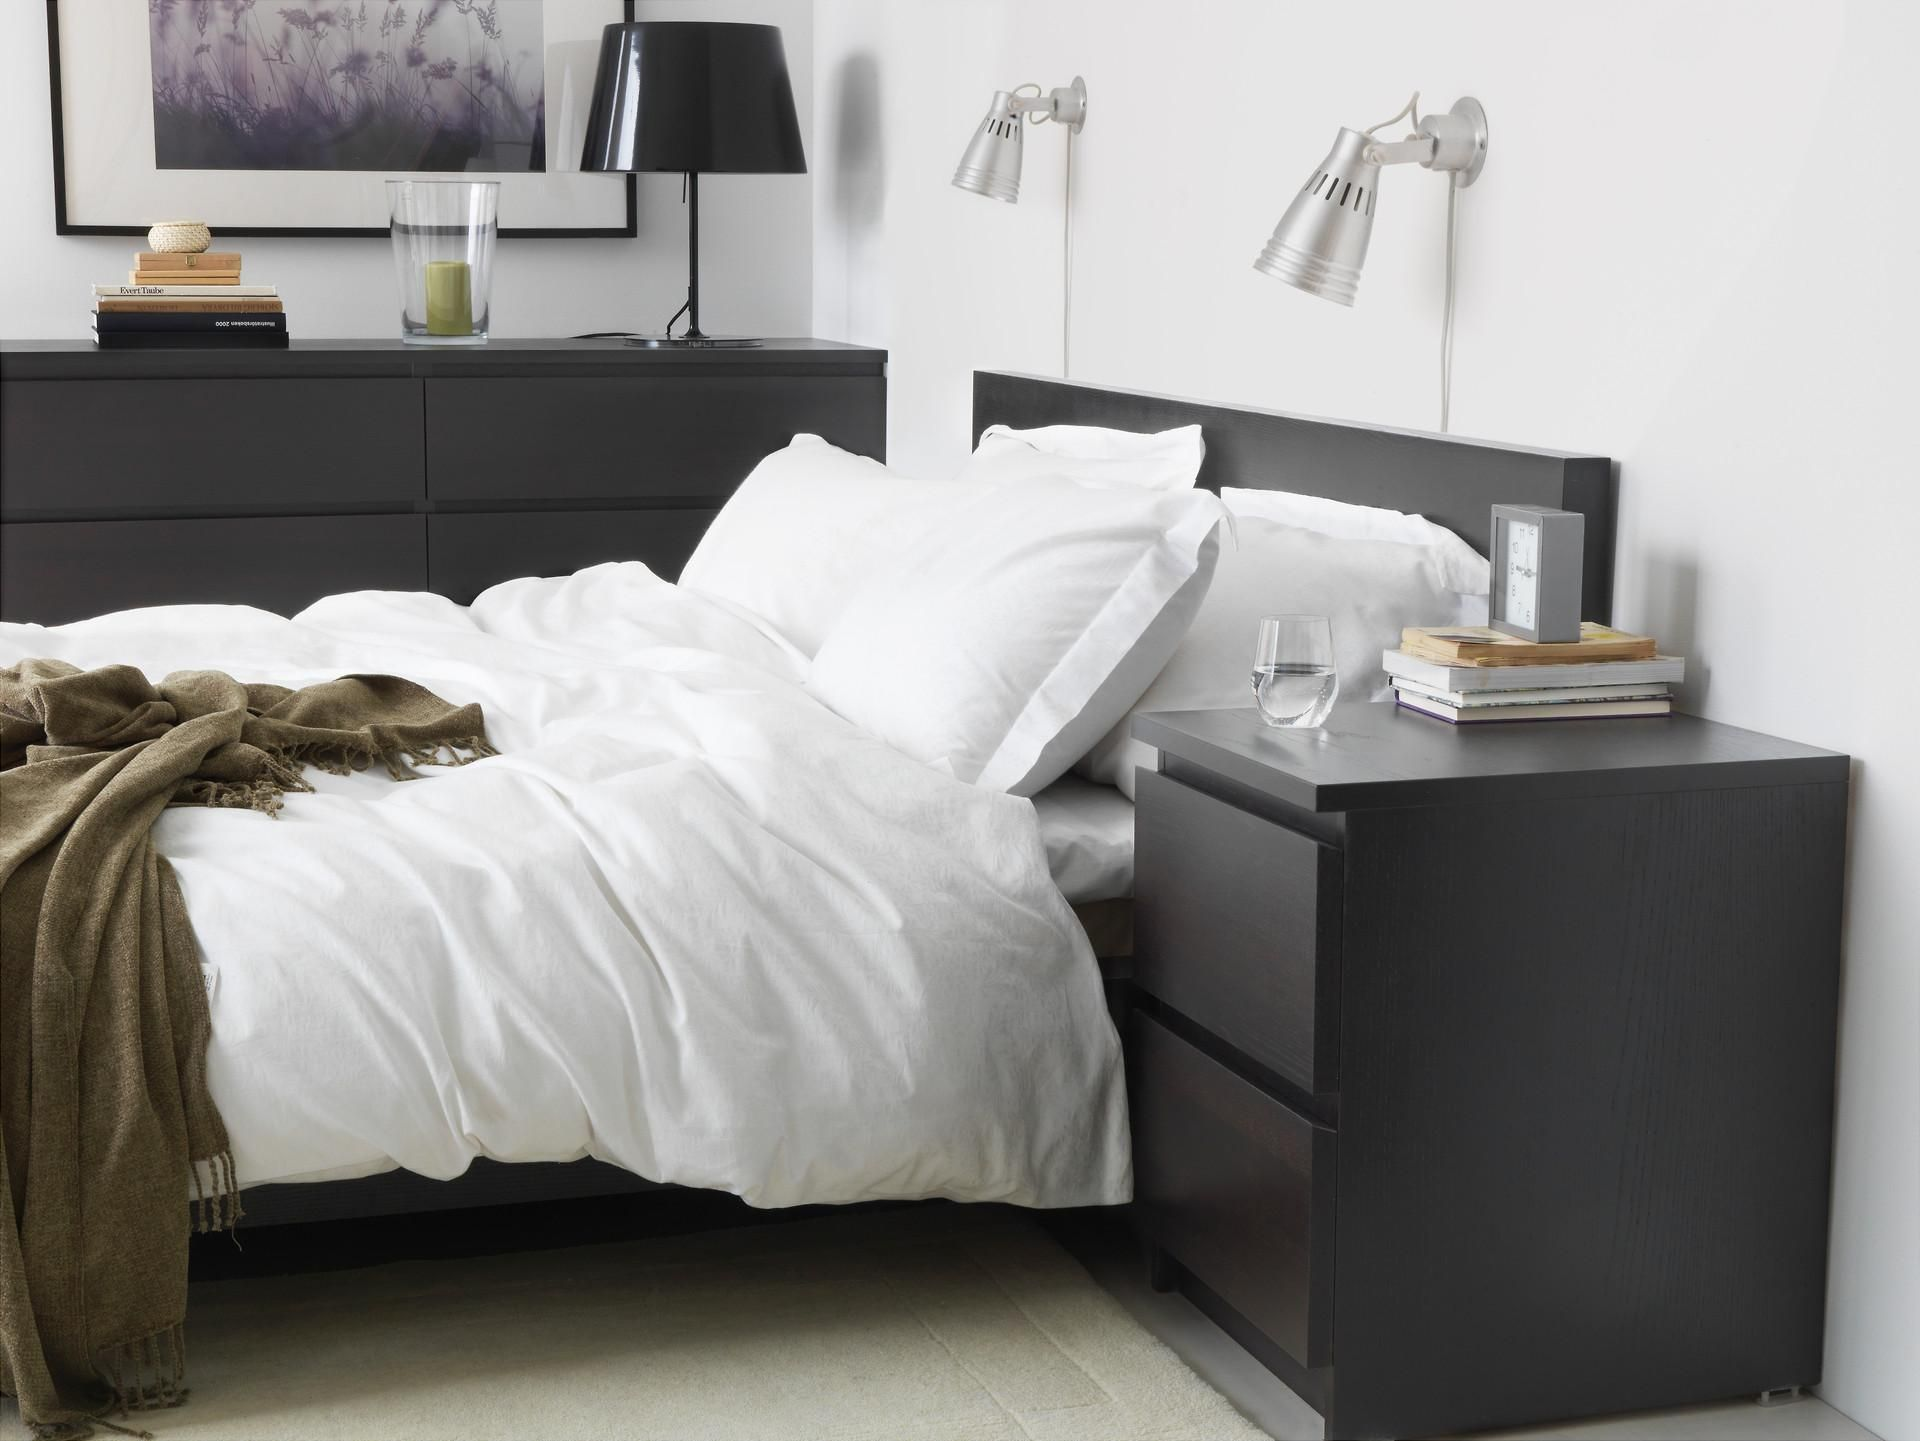 Ikea Us Furniture And Home Furnishings Malm Bed Frame Ikea